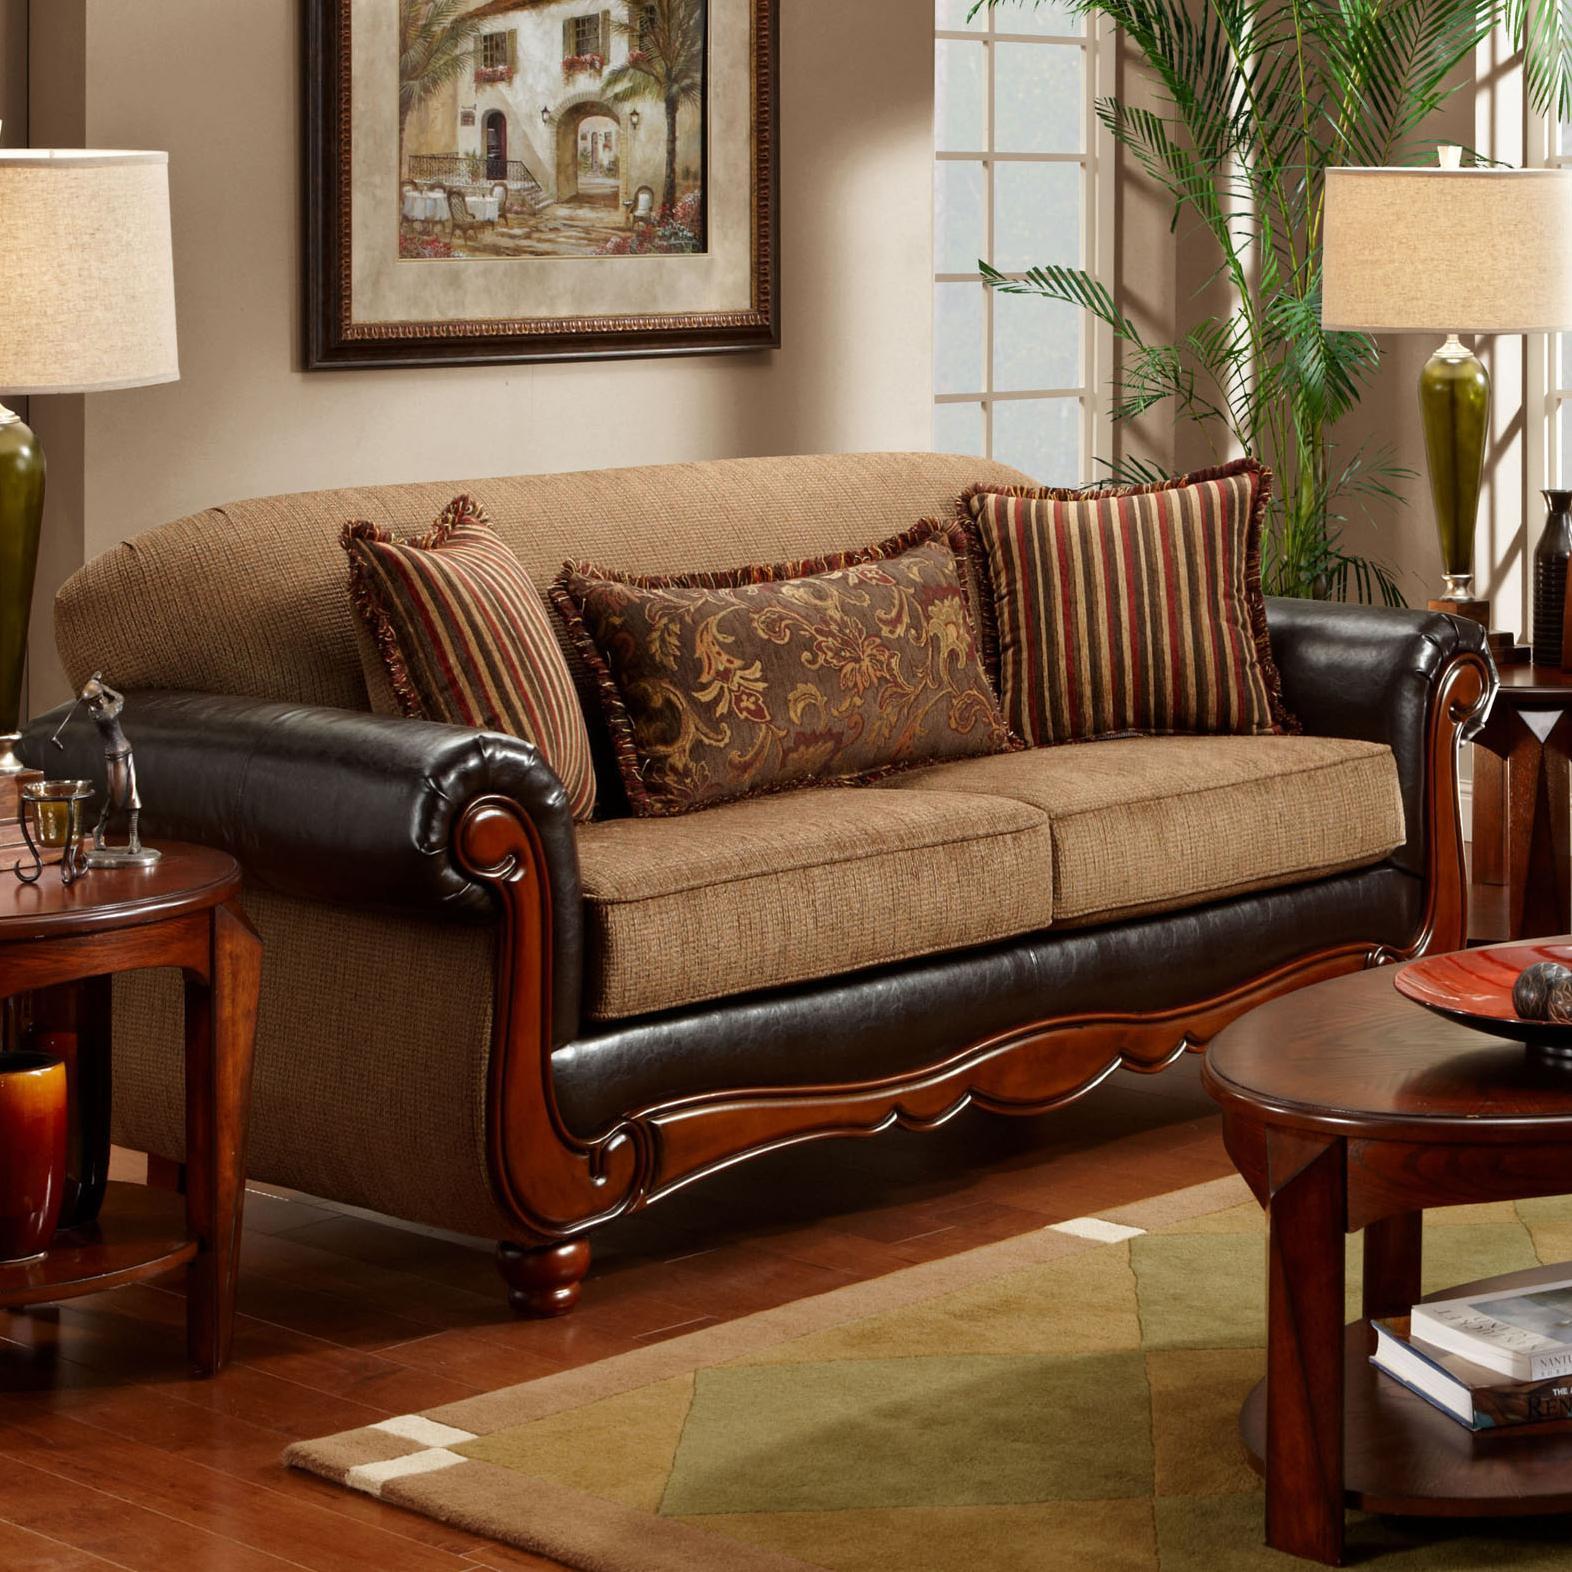 1030 Radar Mocha Sofa by Washington Furniture at Lynn's Furniture & Mattress